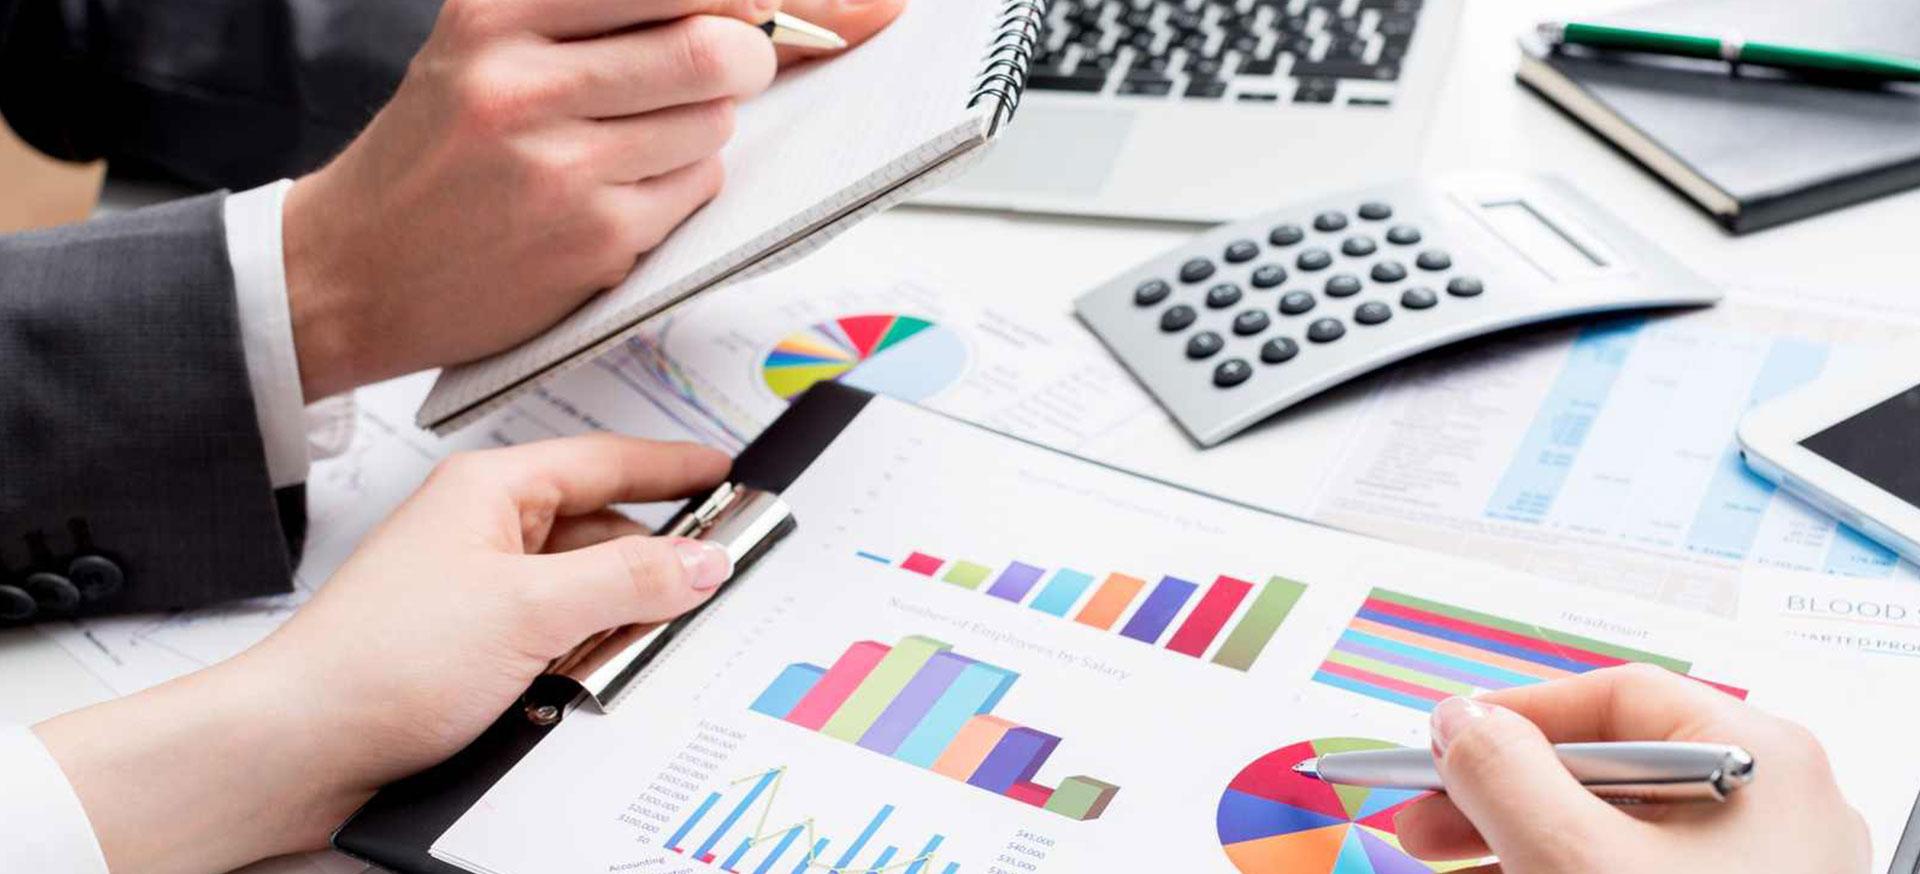 Cloud Based Enterprise Resource Planning (ERP) Solution Company Lahore Pakistan